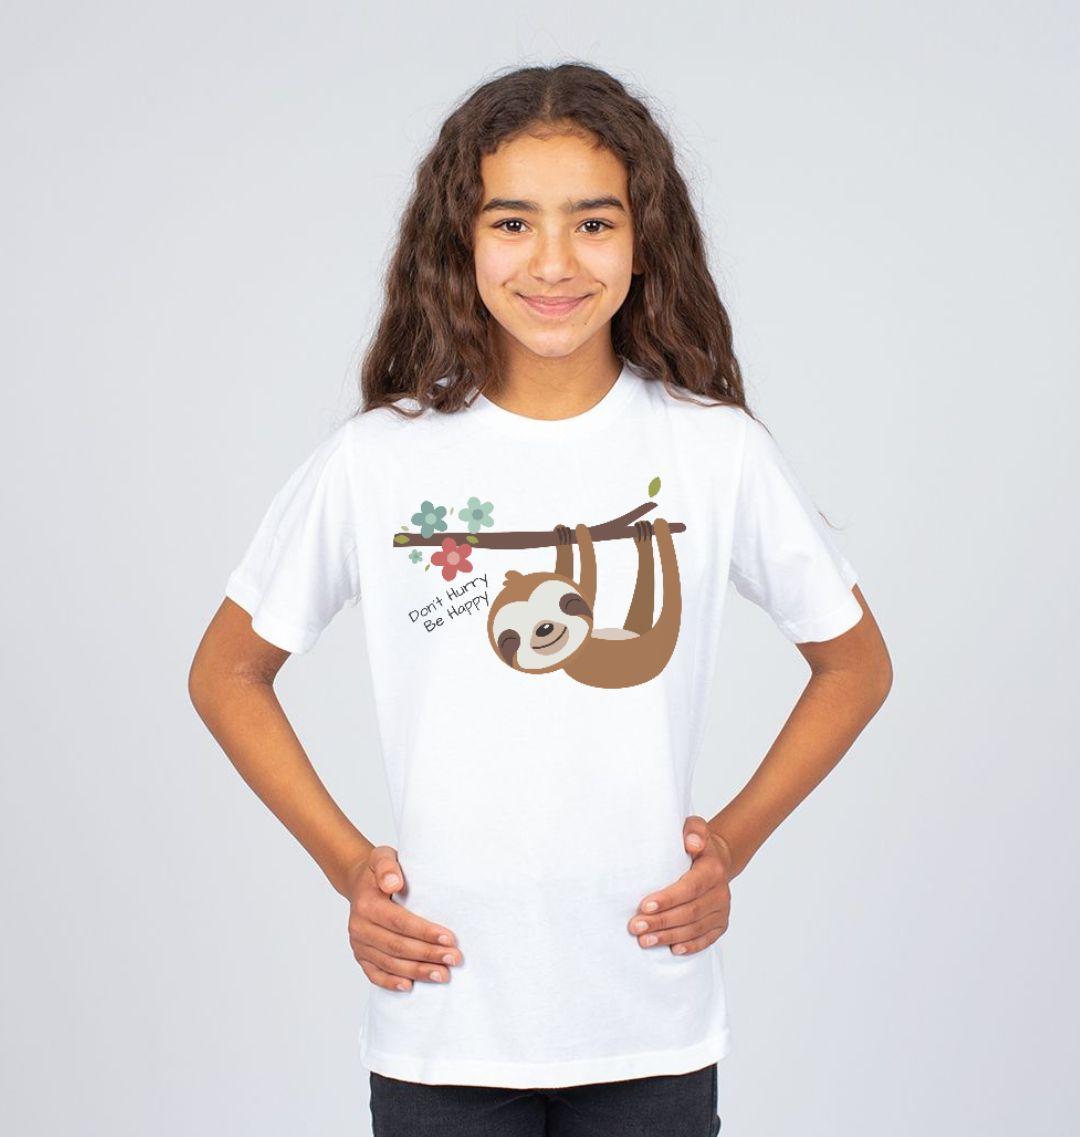 Don't Hurry Be Happy Cute Sloth Children's Organic Cotton T Shirt white